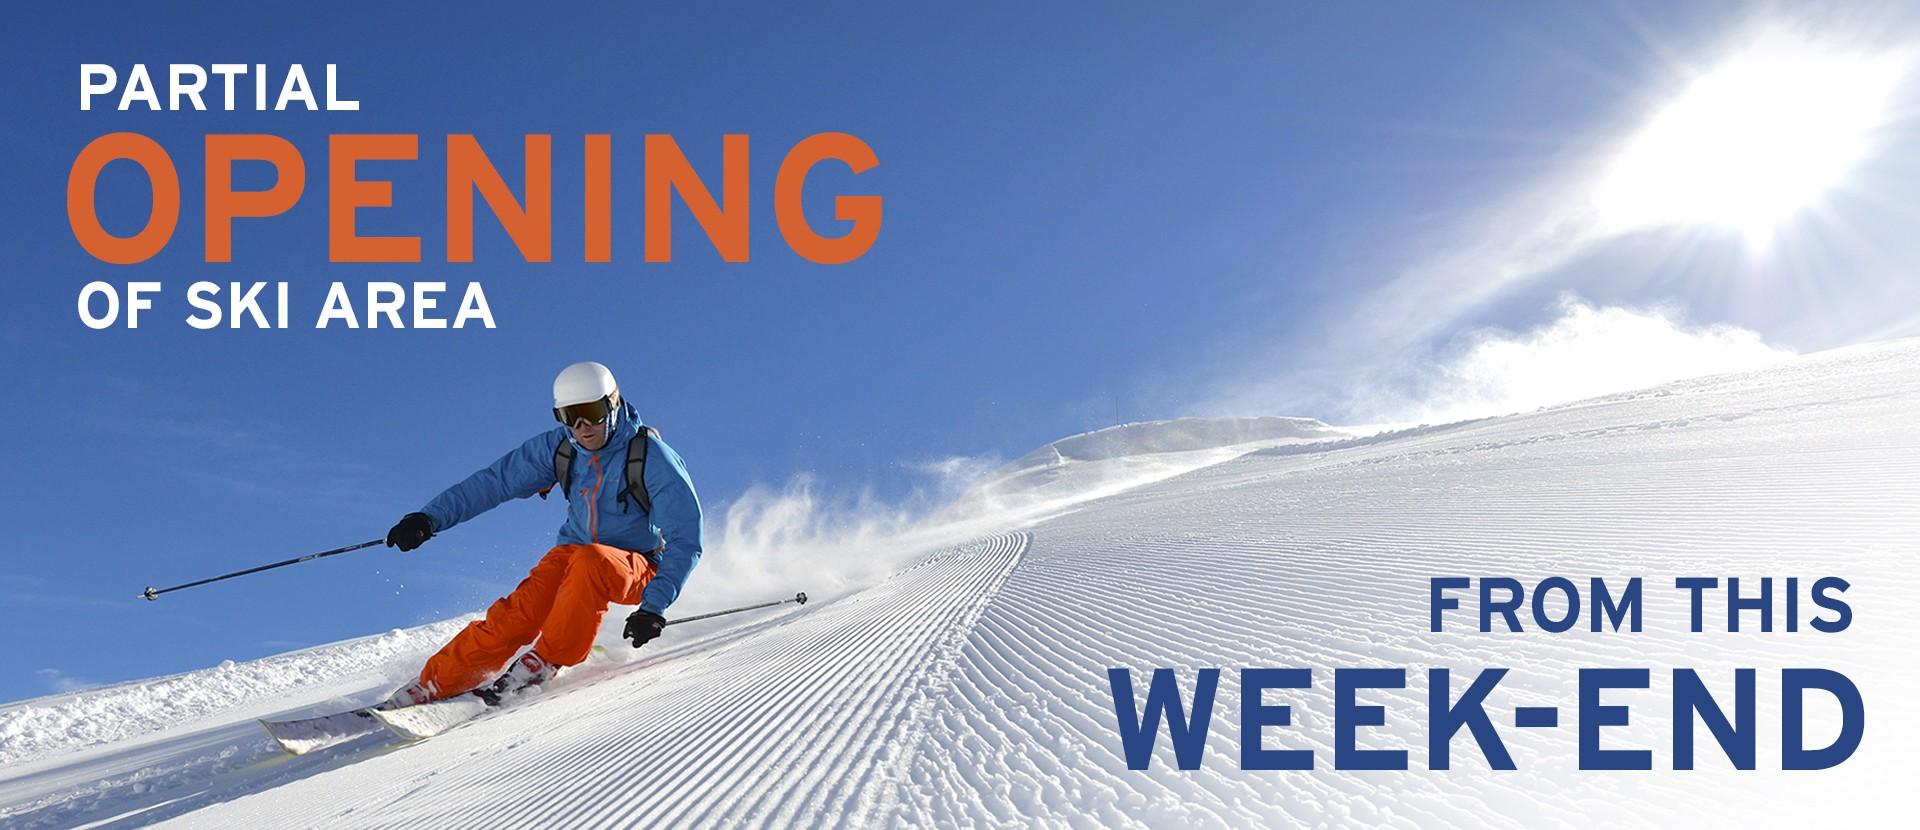 Ski area openning